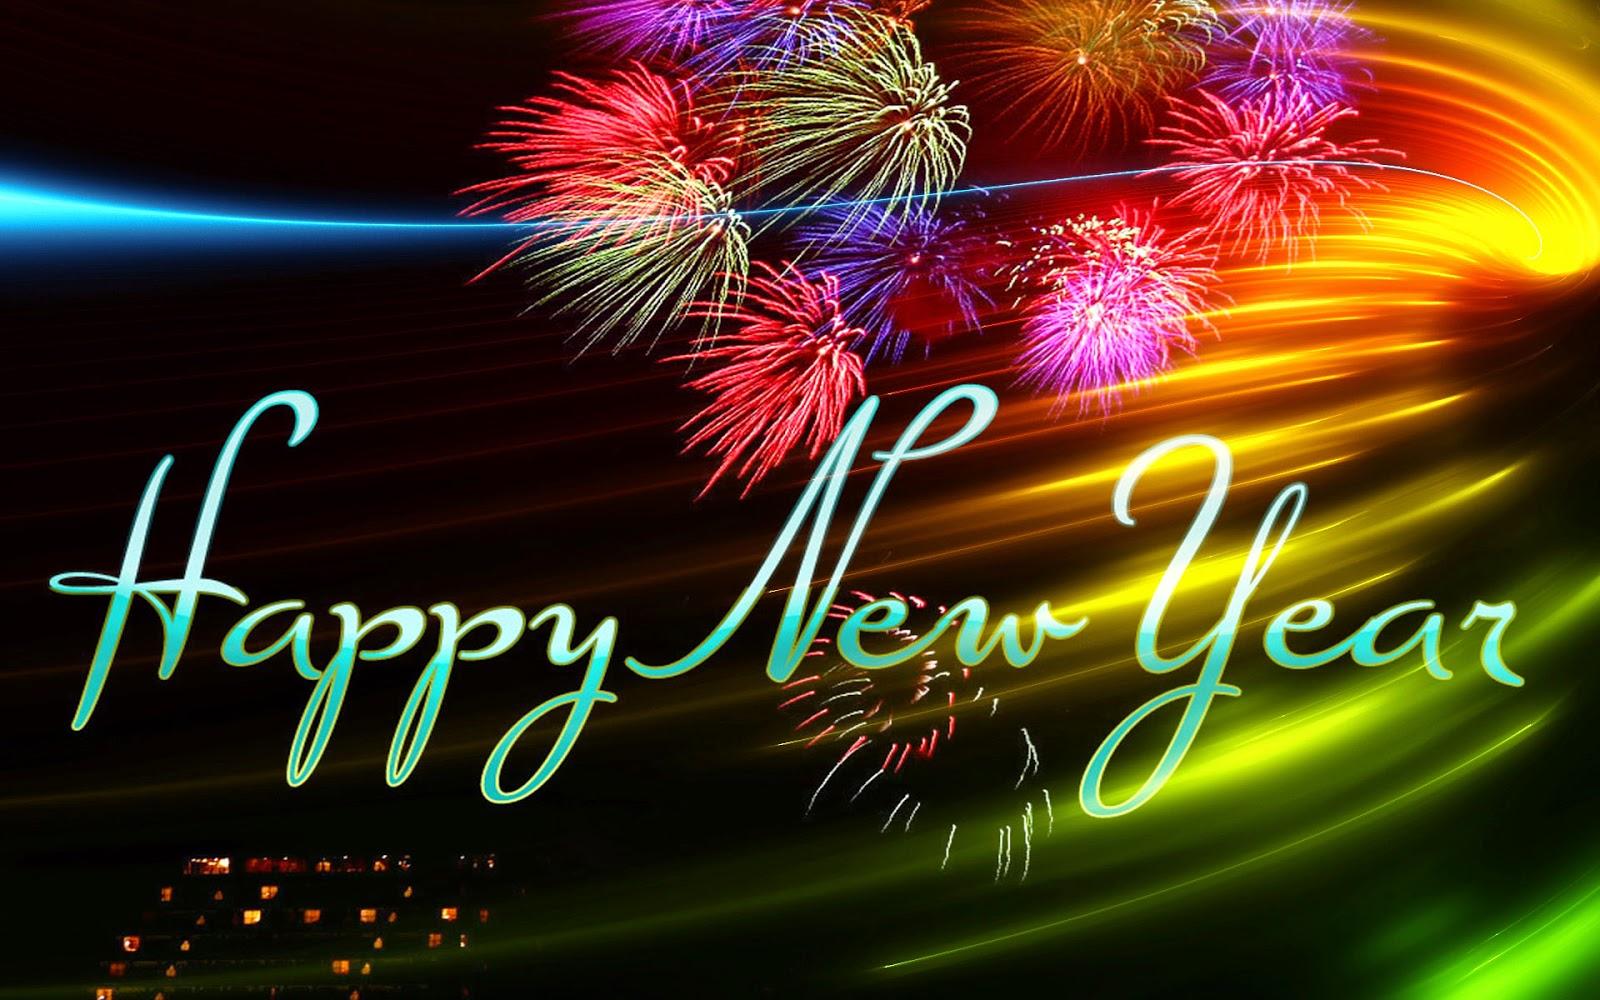 Imagini pentru happy new year